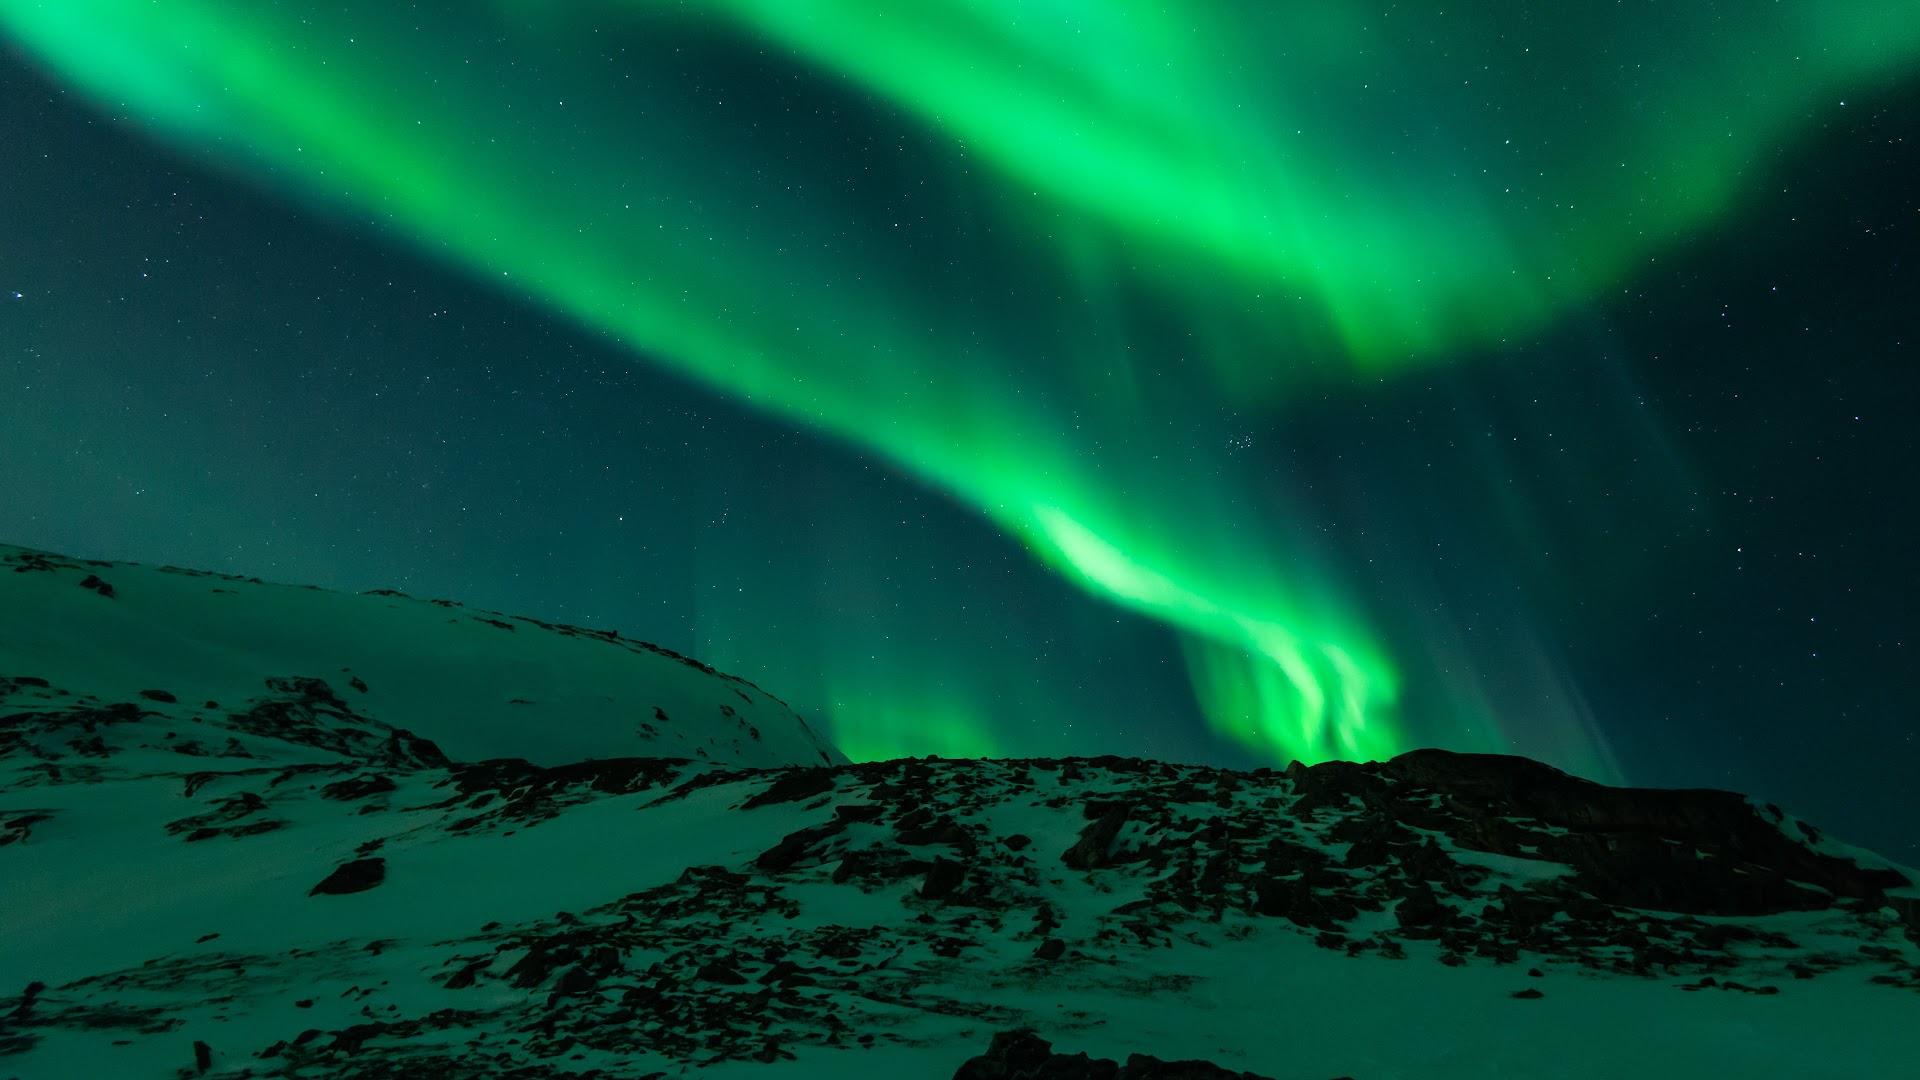 northern lights wallpaper 4k - photo #22